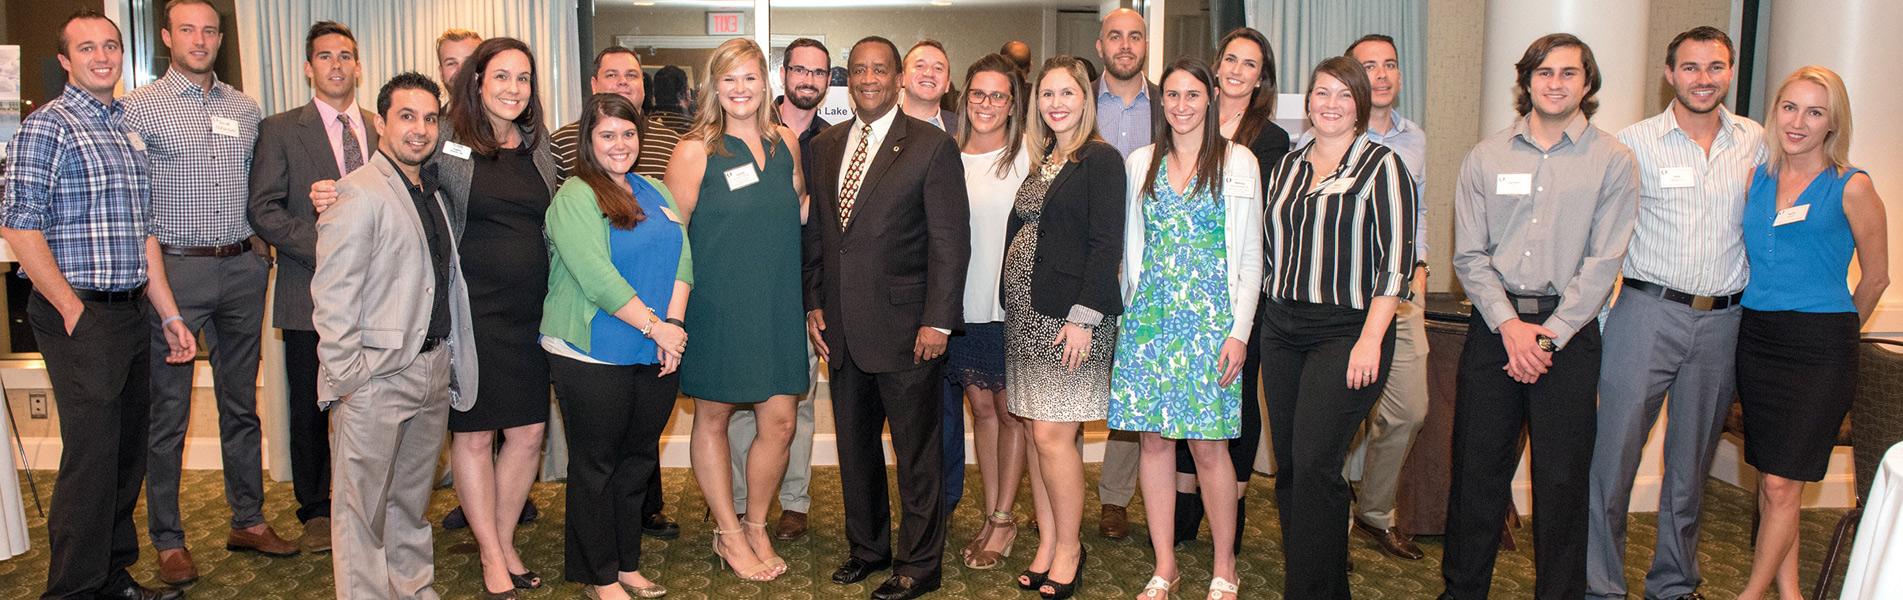 Tampa Alumni Chapter with President Bradshaw